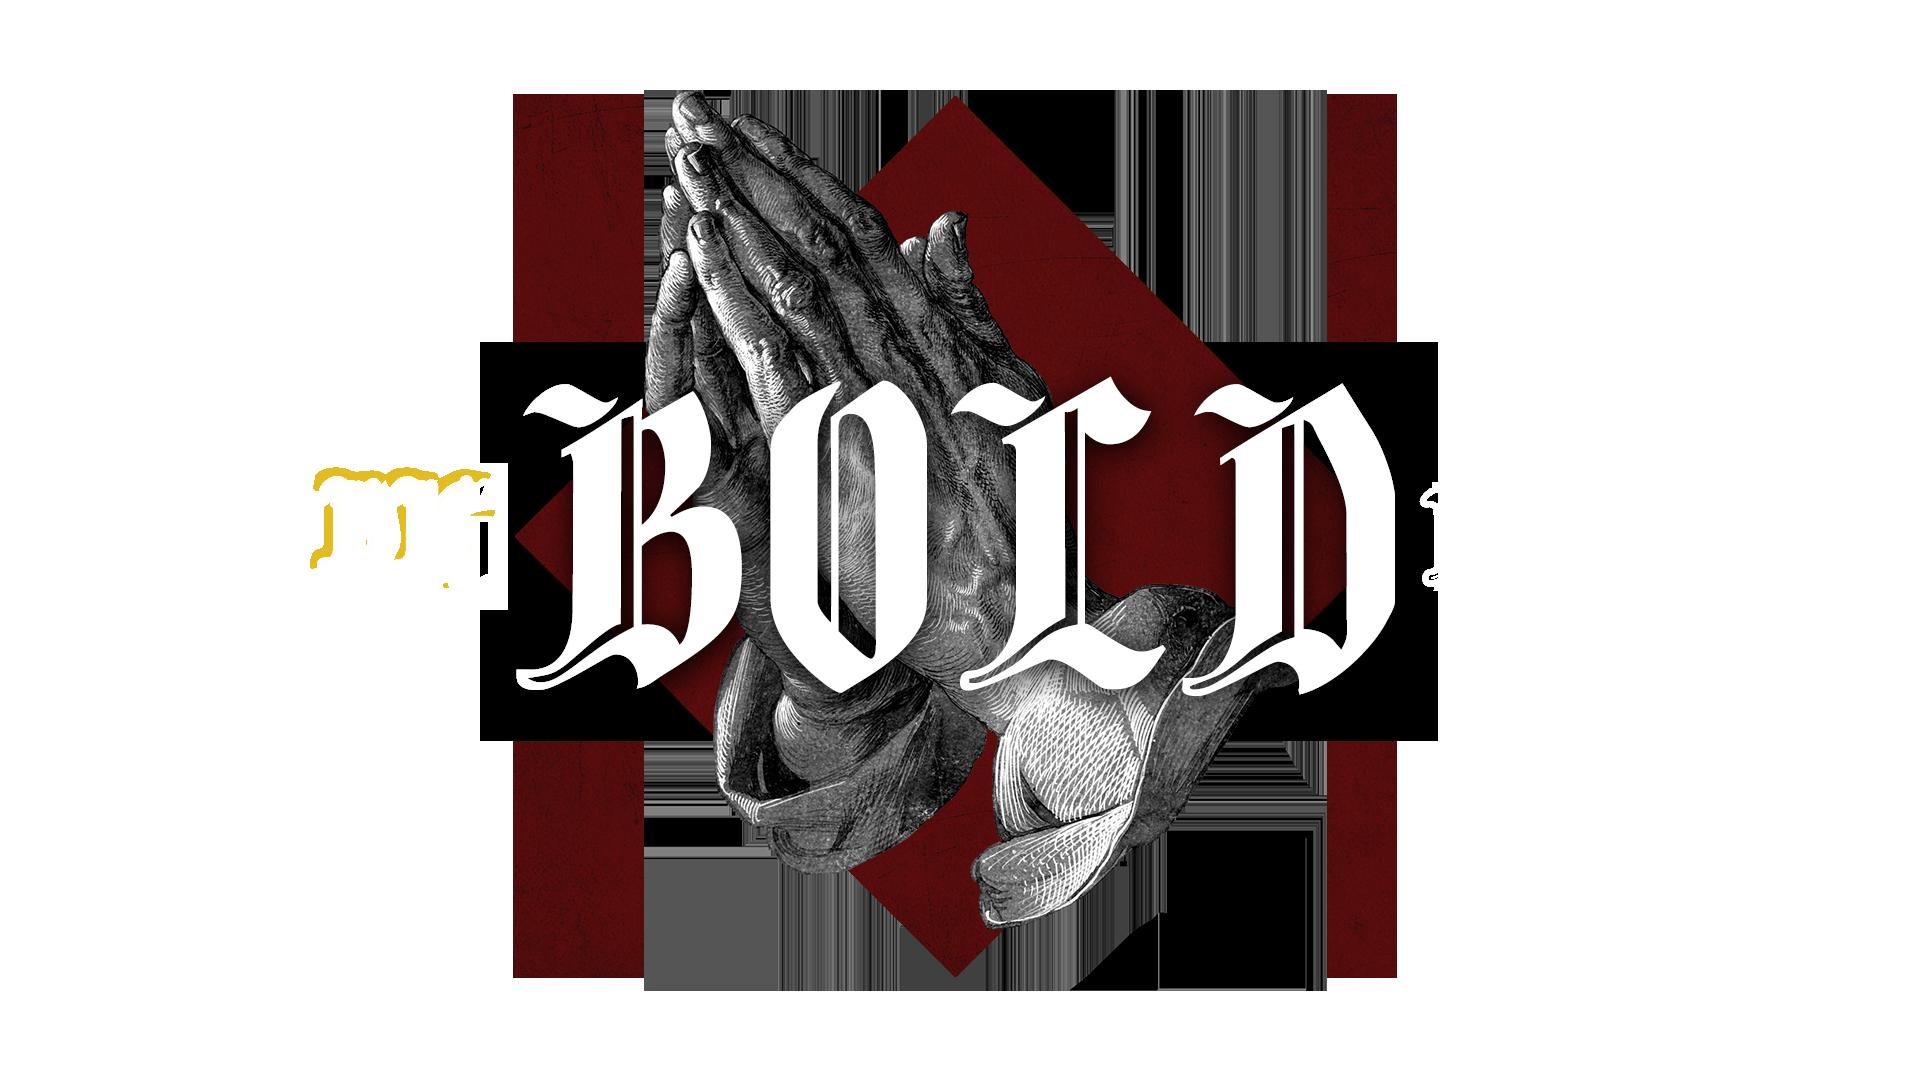 BIG-BOLD-LIVES-Series.png